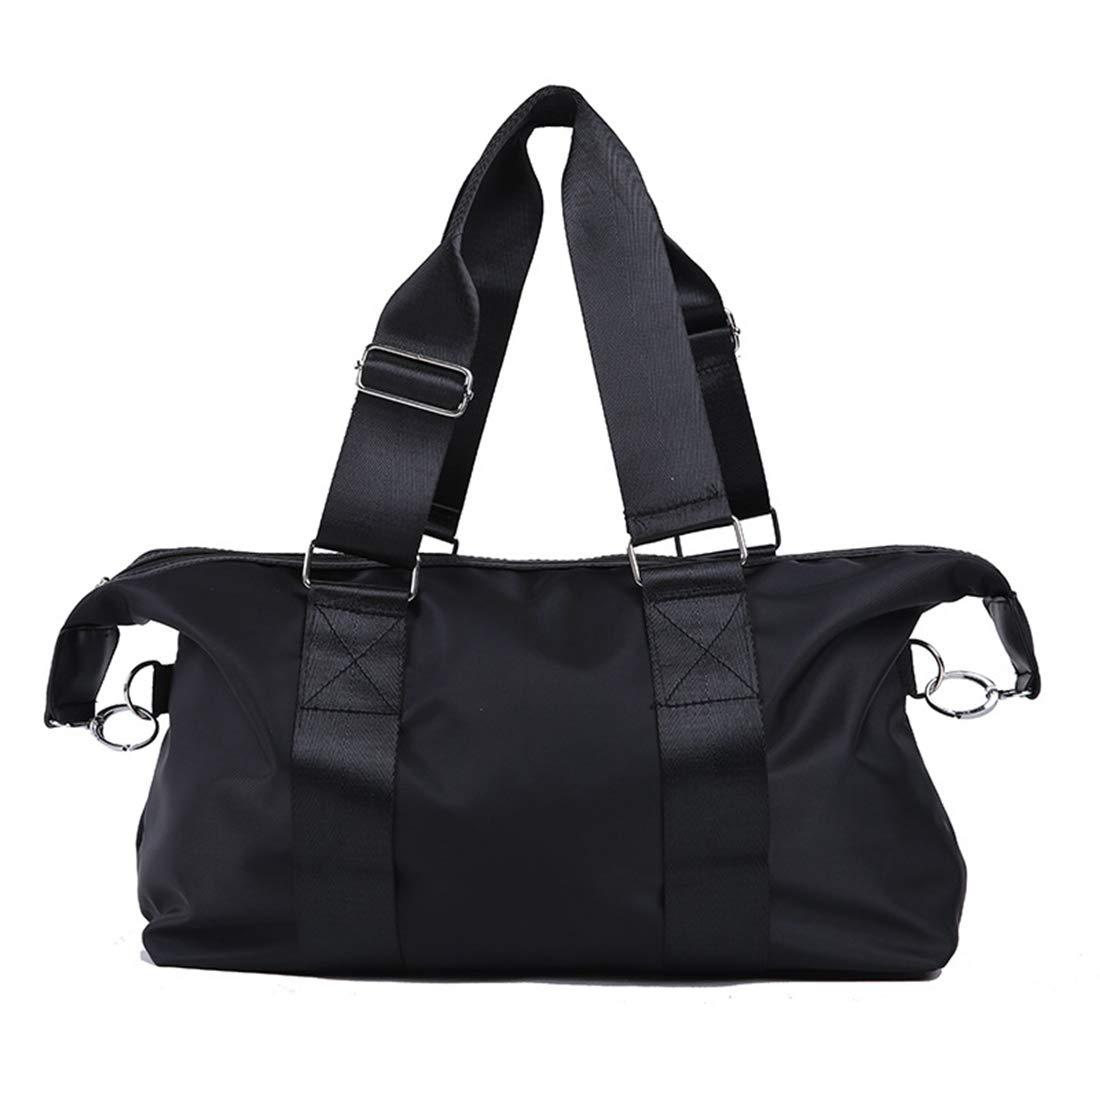 Carriemeow Luggage Sports Bag Waterproof Large-Capacity Handbag Oxford Cloth Nylon Diagonal Package Female Travel Bag Short-haul Handbags Business Travel Package Large Female Duffel Bag